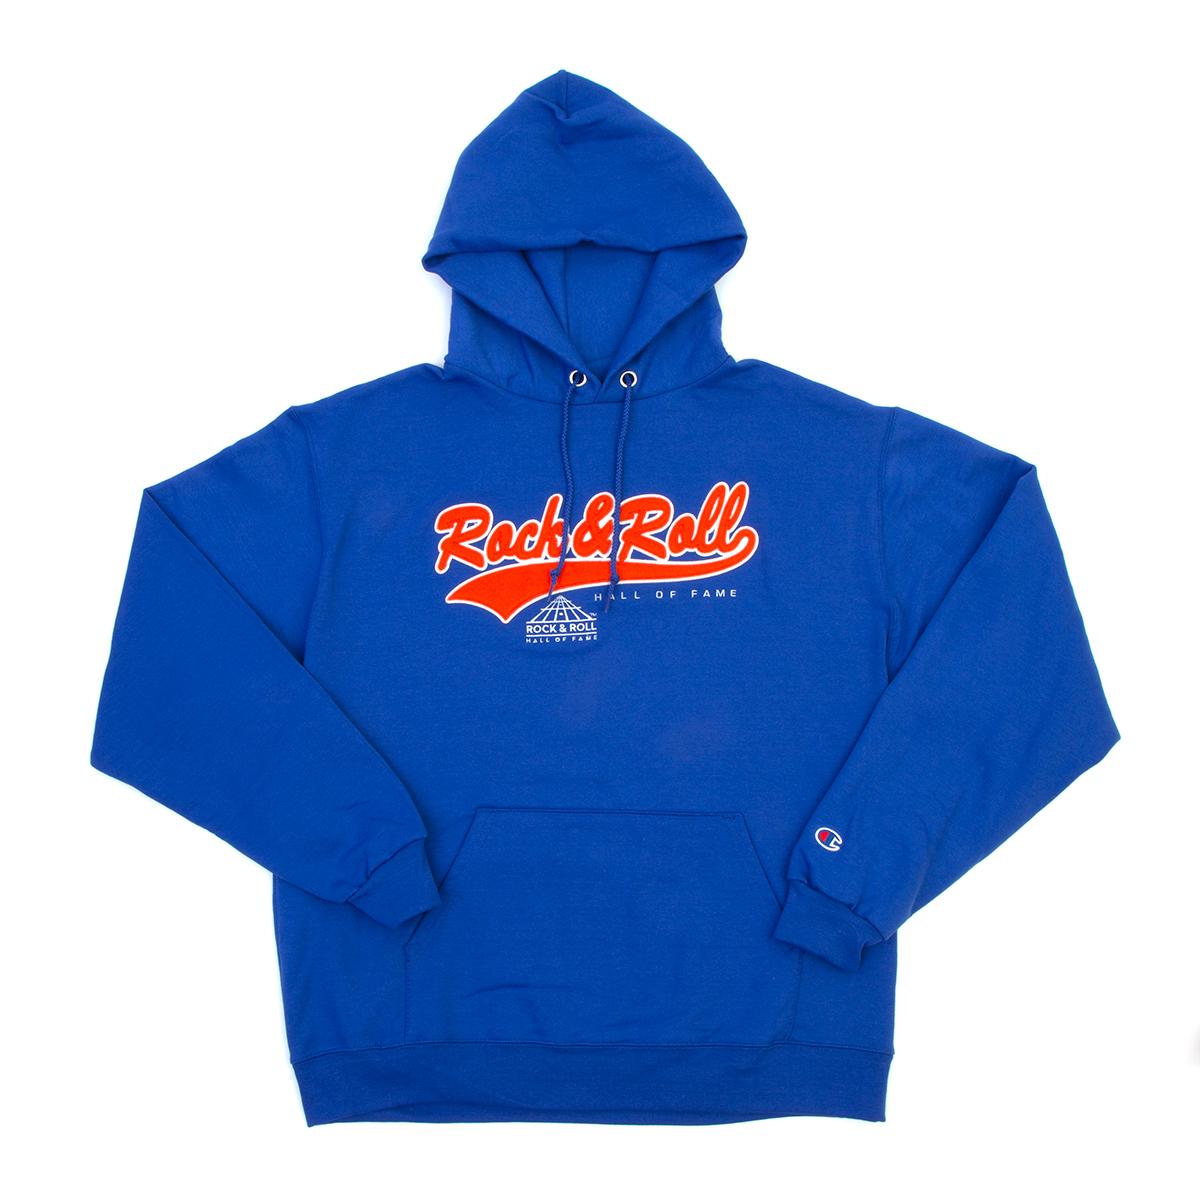 Champion Rock Hall Blue & Orange Applique Hoodie